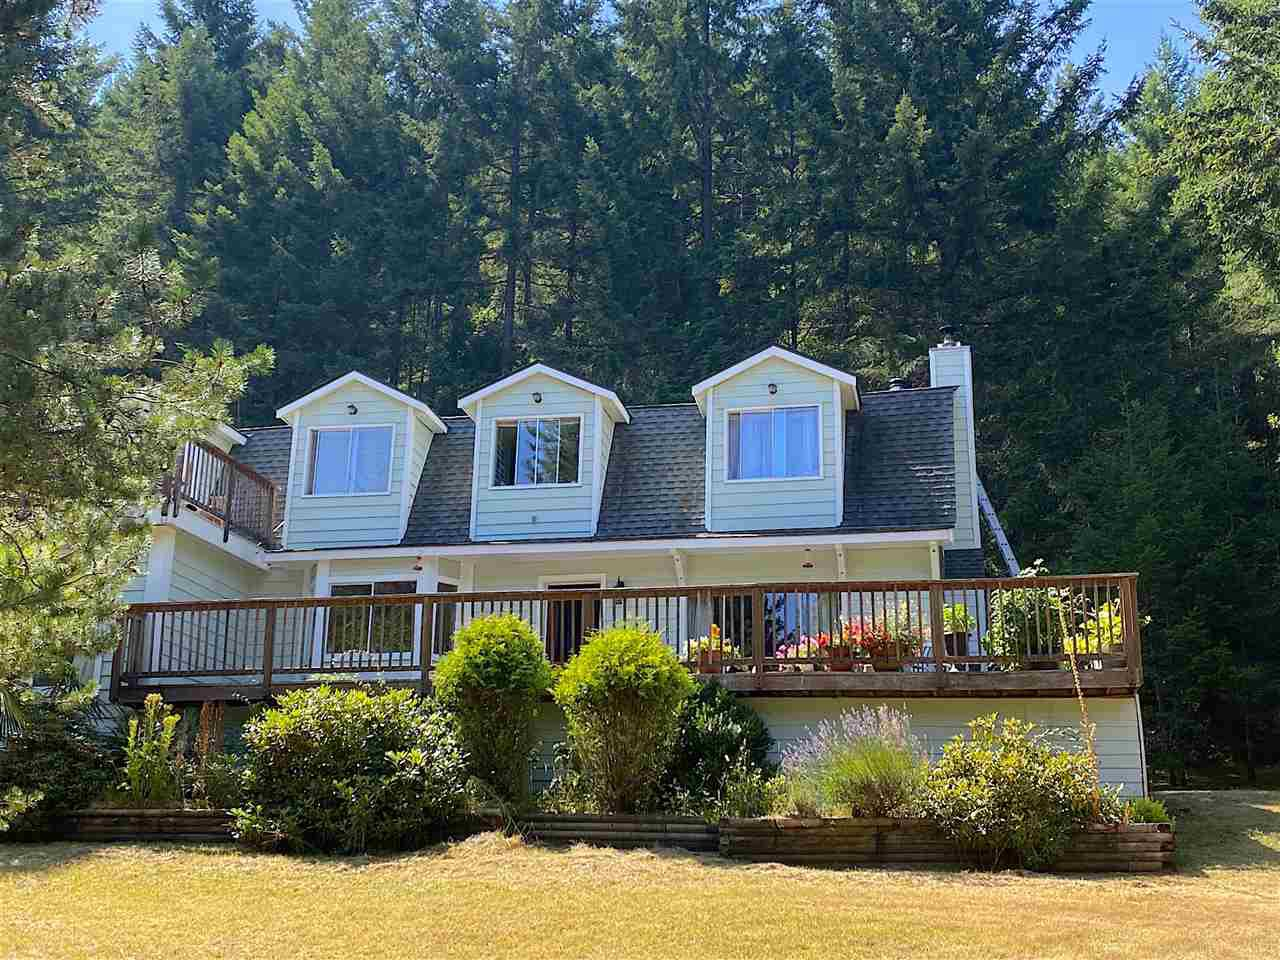 Main Photo: 749 GEORGIA VIEW Road: Galiano Island House for sale (Islands-Van. & Gulf)  : MLS®# R2487145